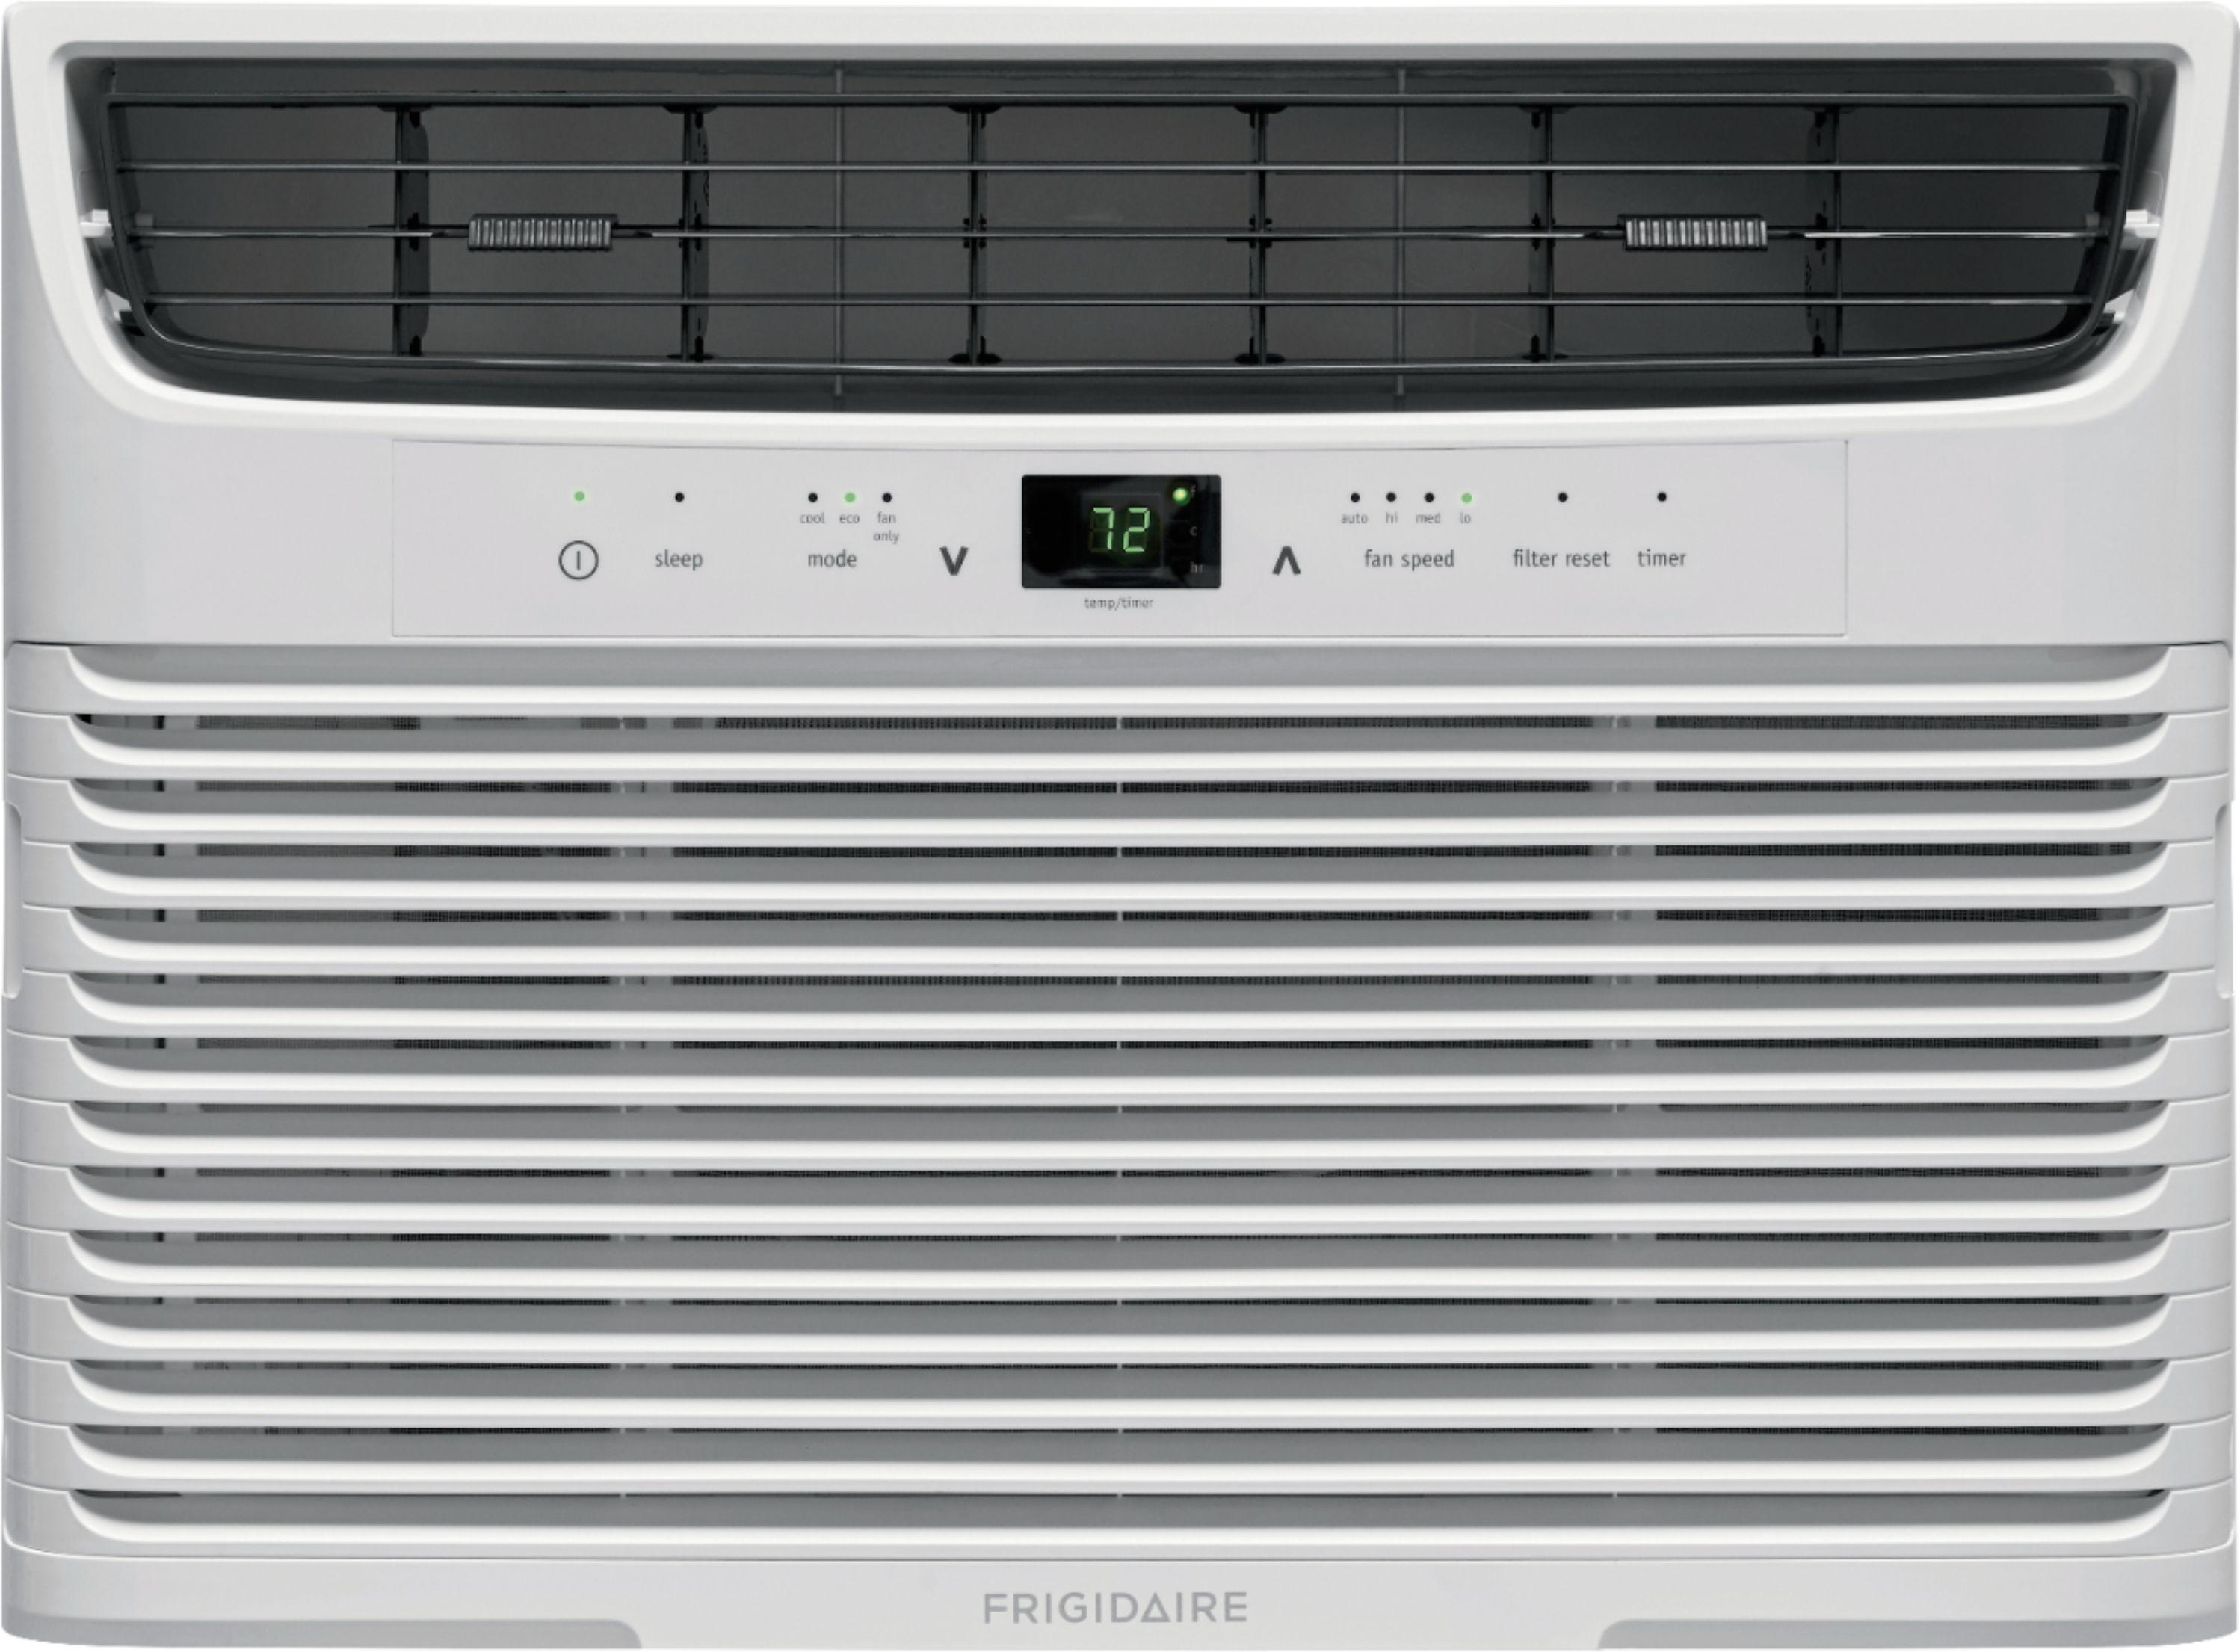 Frigidaire - 250 Sq. Ft. Window Air Conditioner - White